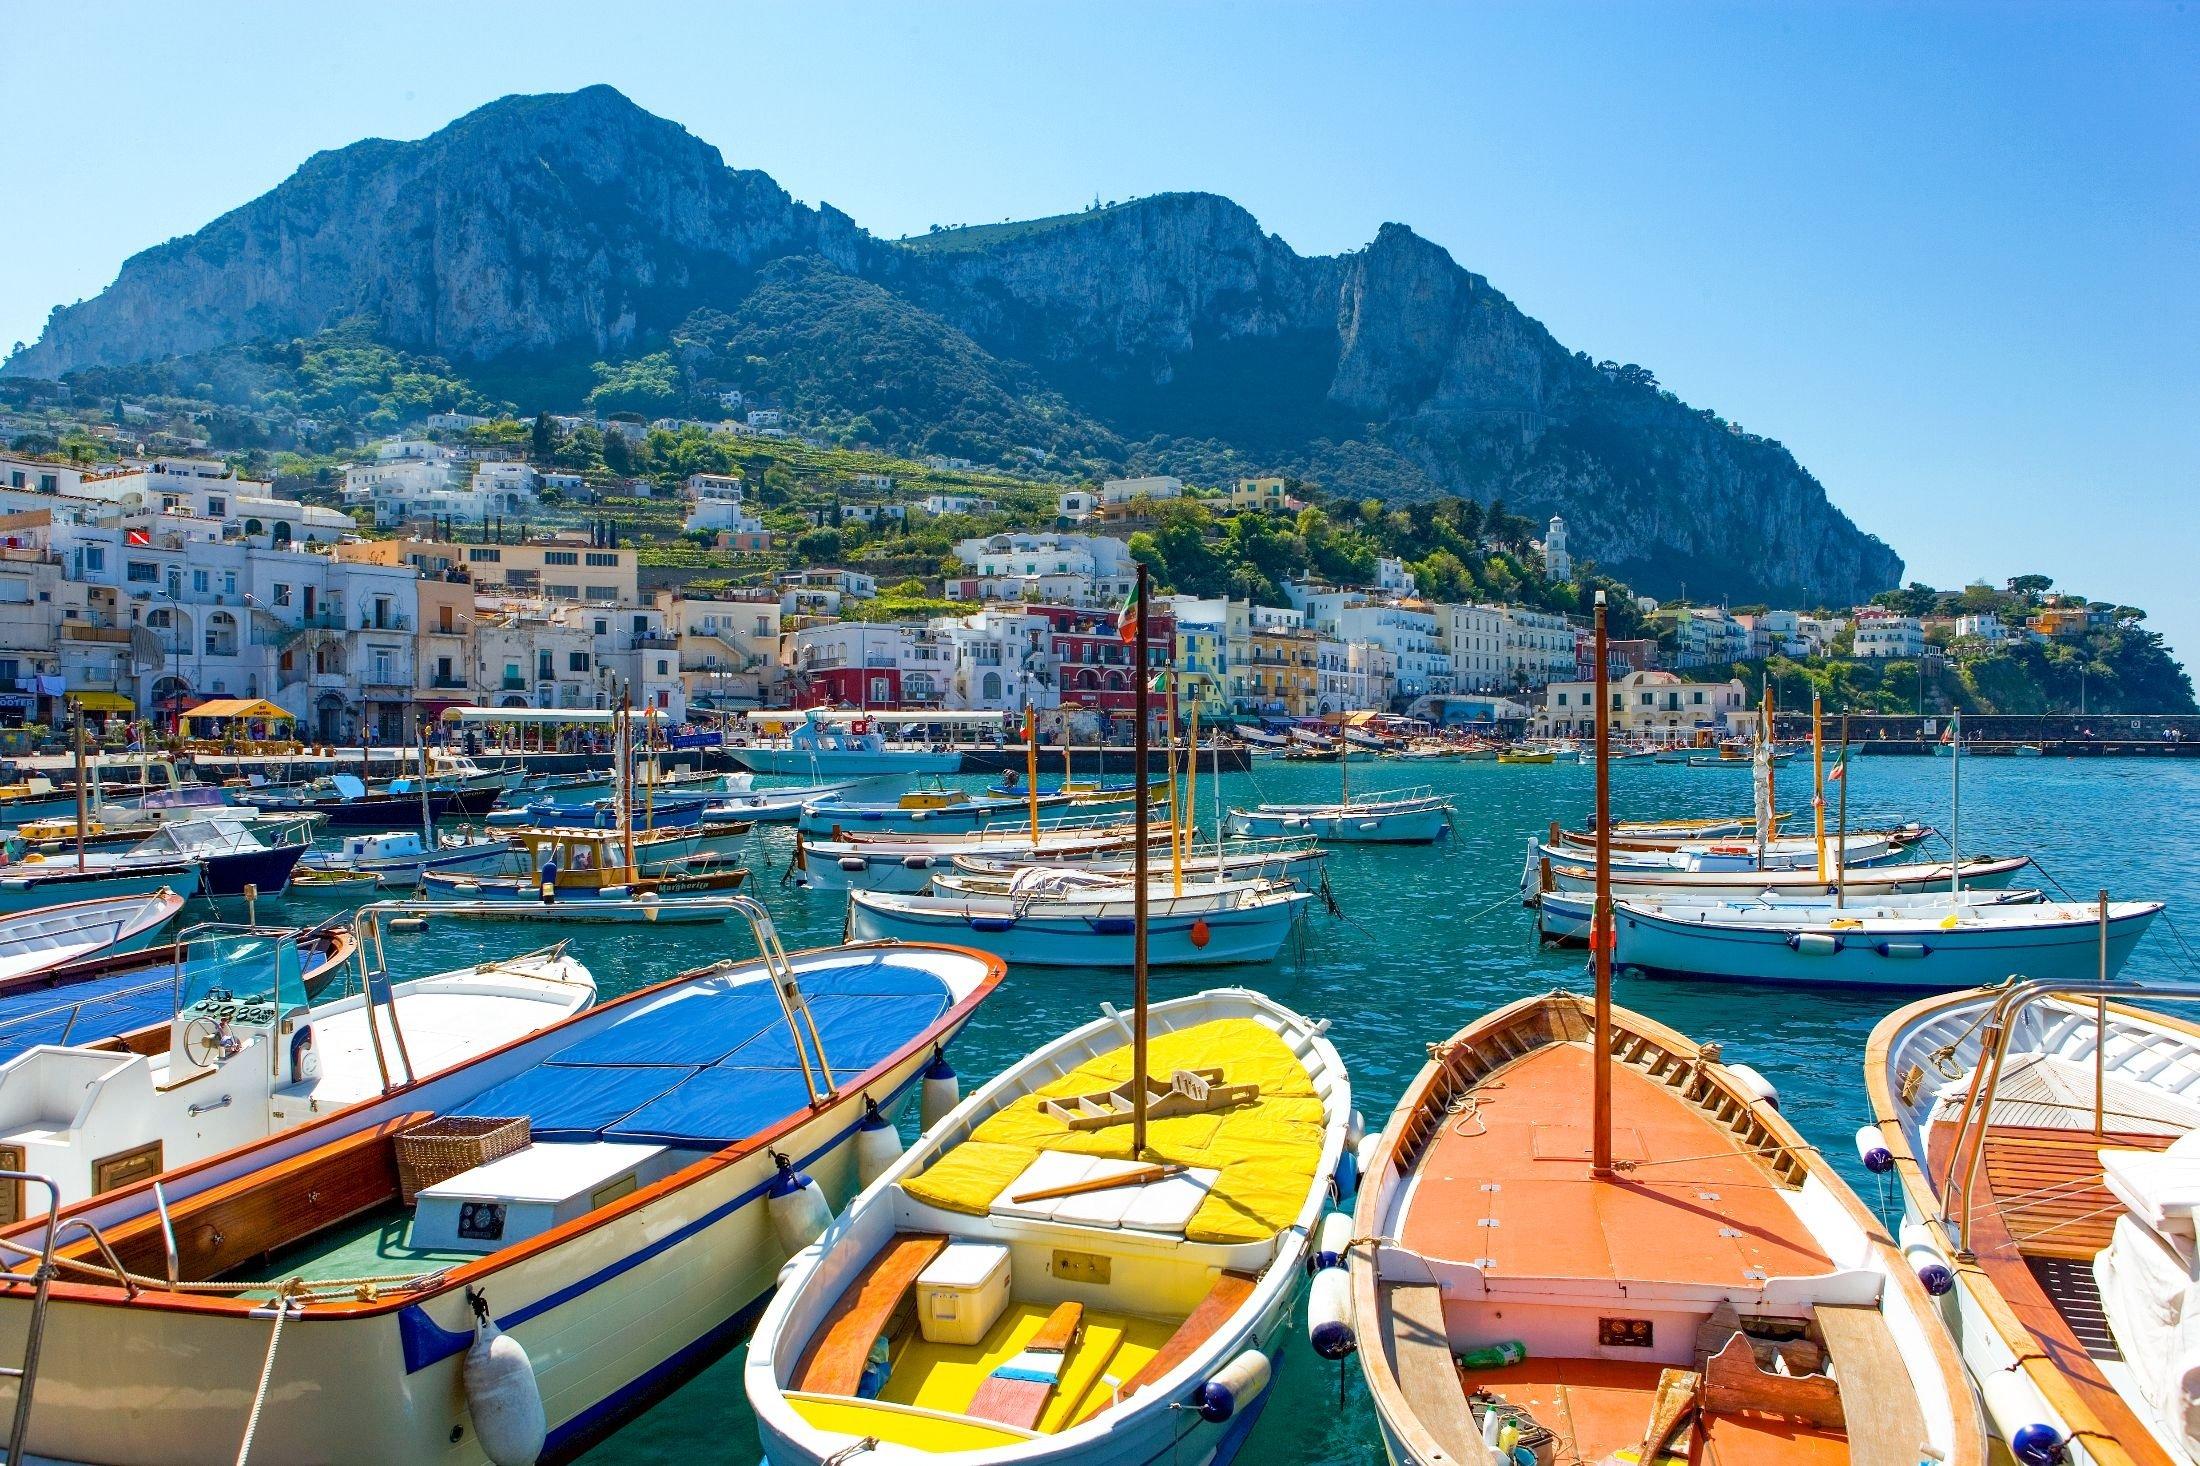 Boats float in harbor of the island of Capri, Italy. (Shutterstock Photo)